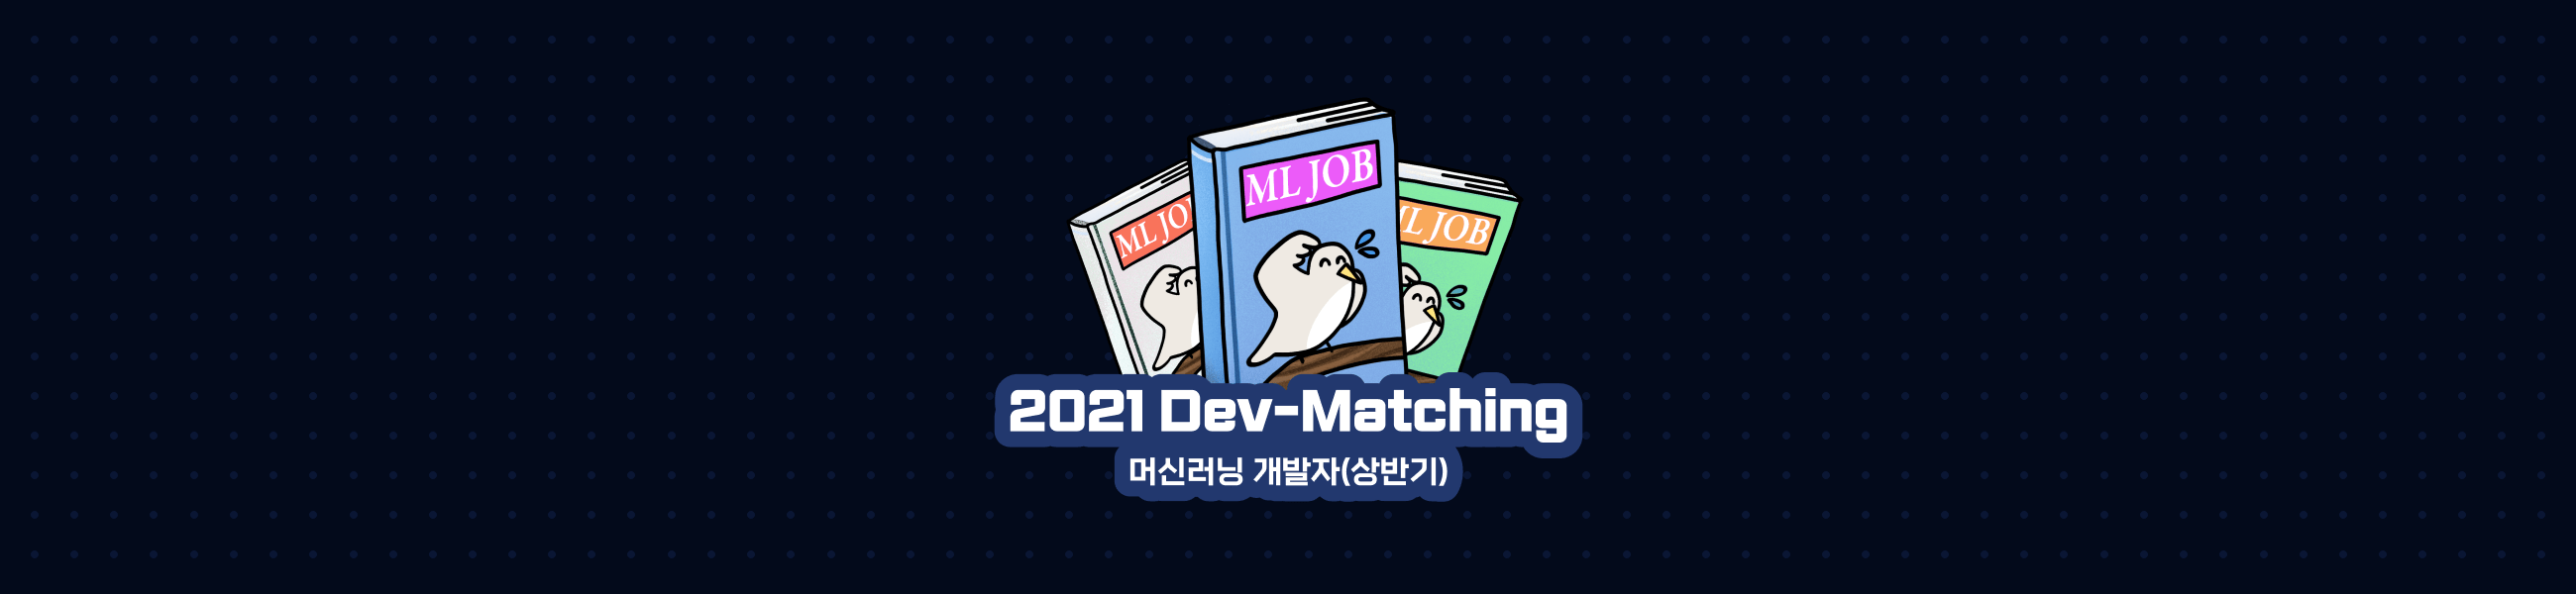 2021 Dev-Matching: 머신러닝 개발자의 이미지